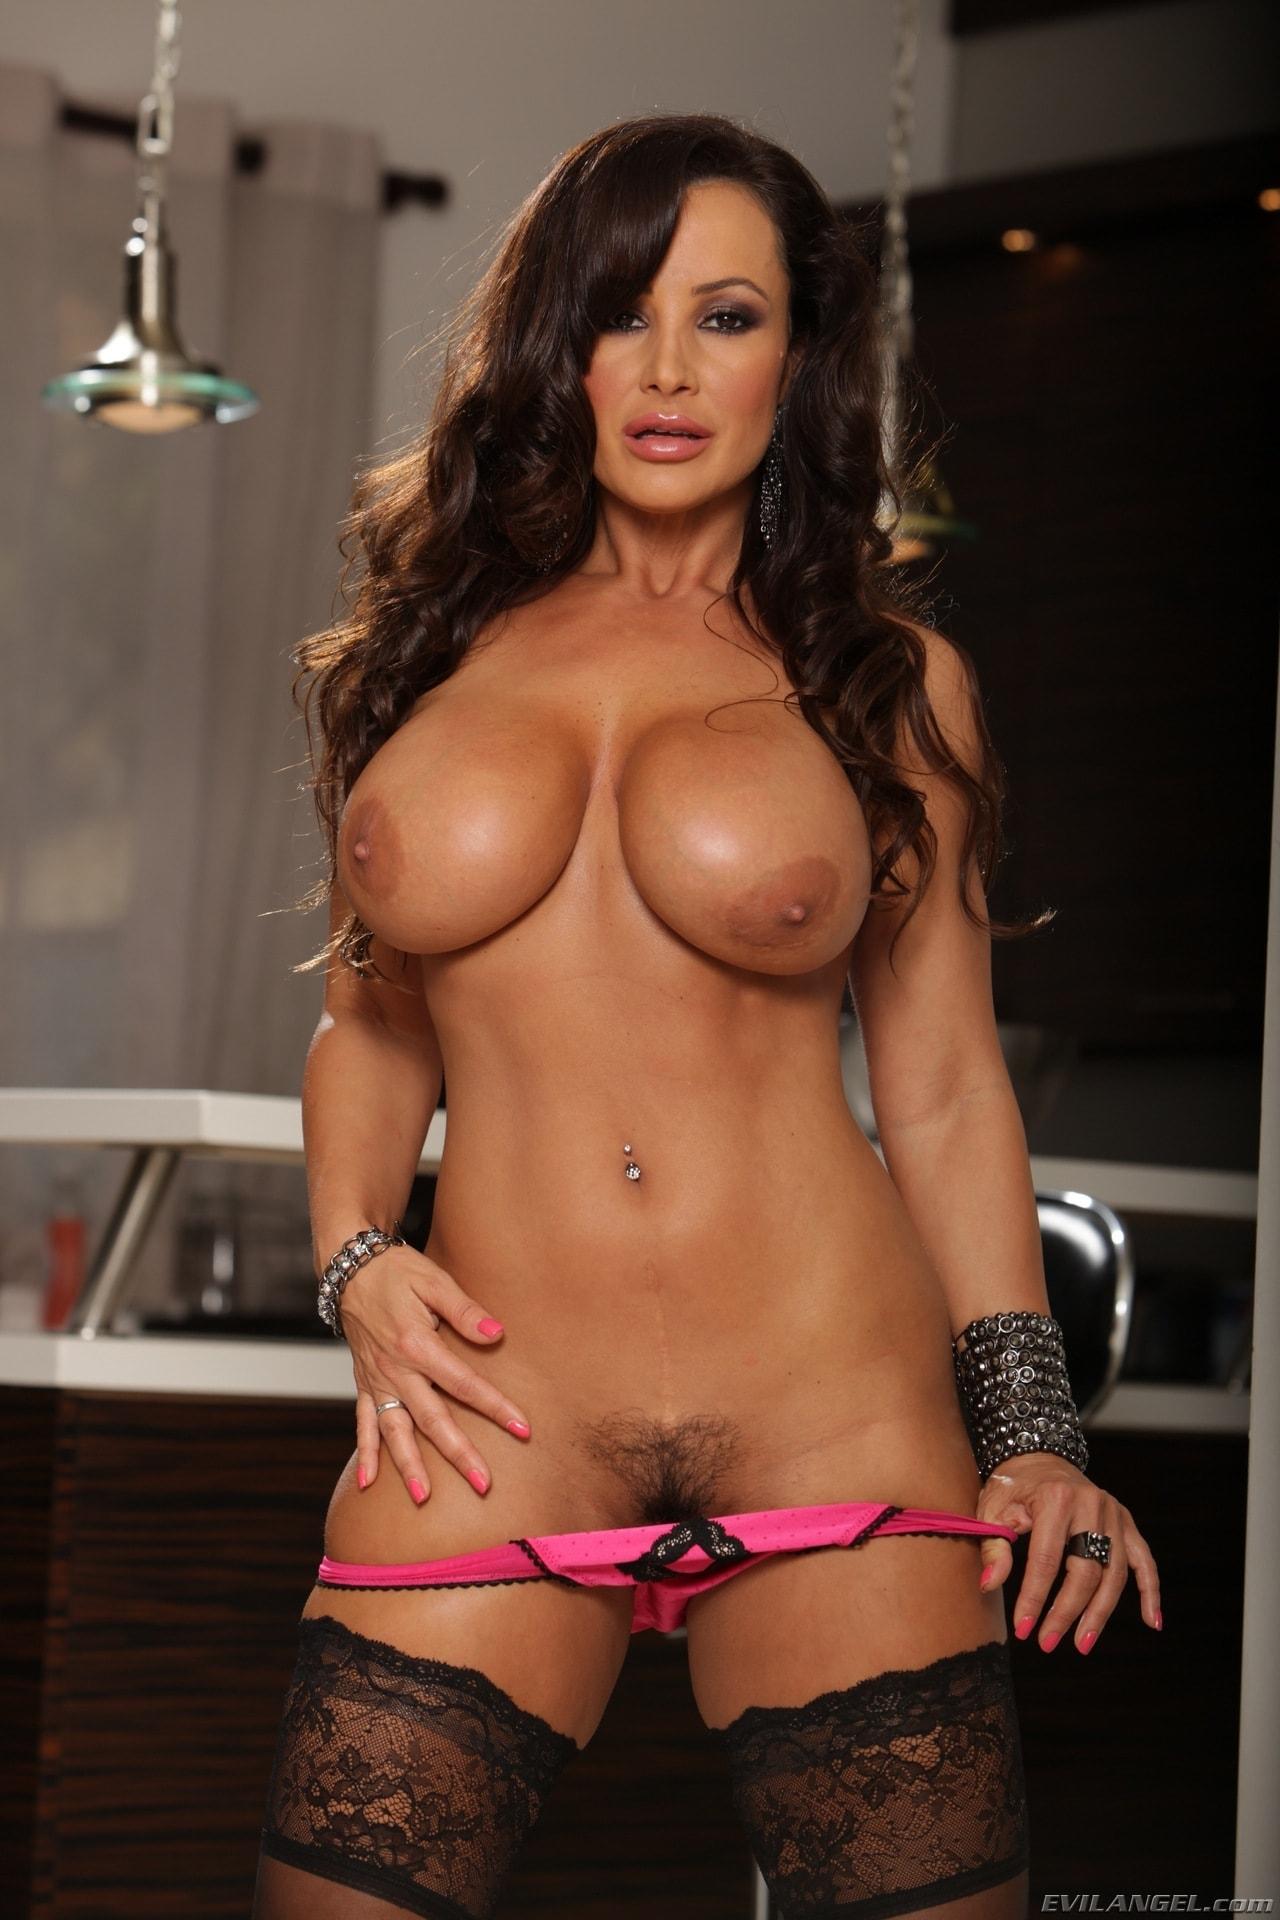 malaika-arora-nude-photos-sexy-naked-all-the-way-girls